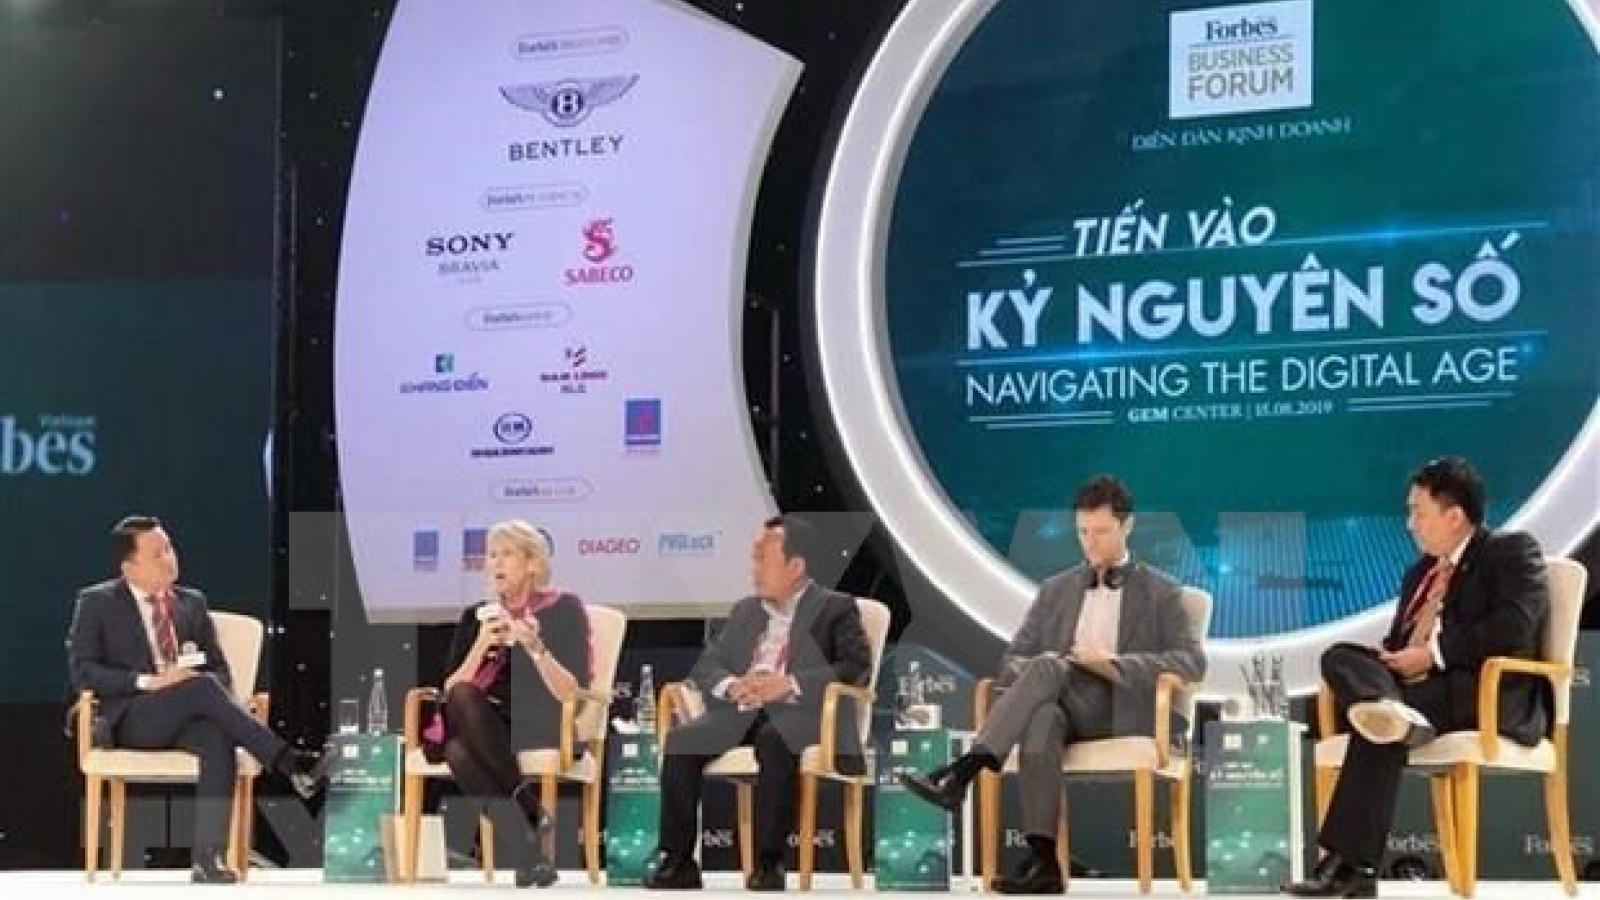 Forbes business forum confers Vietnam navigating digital age